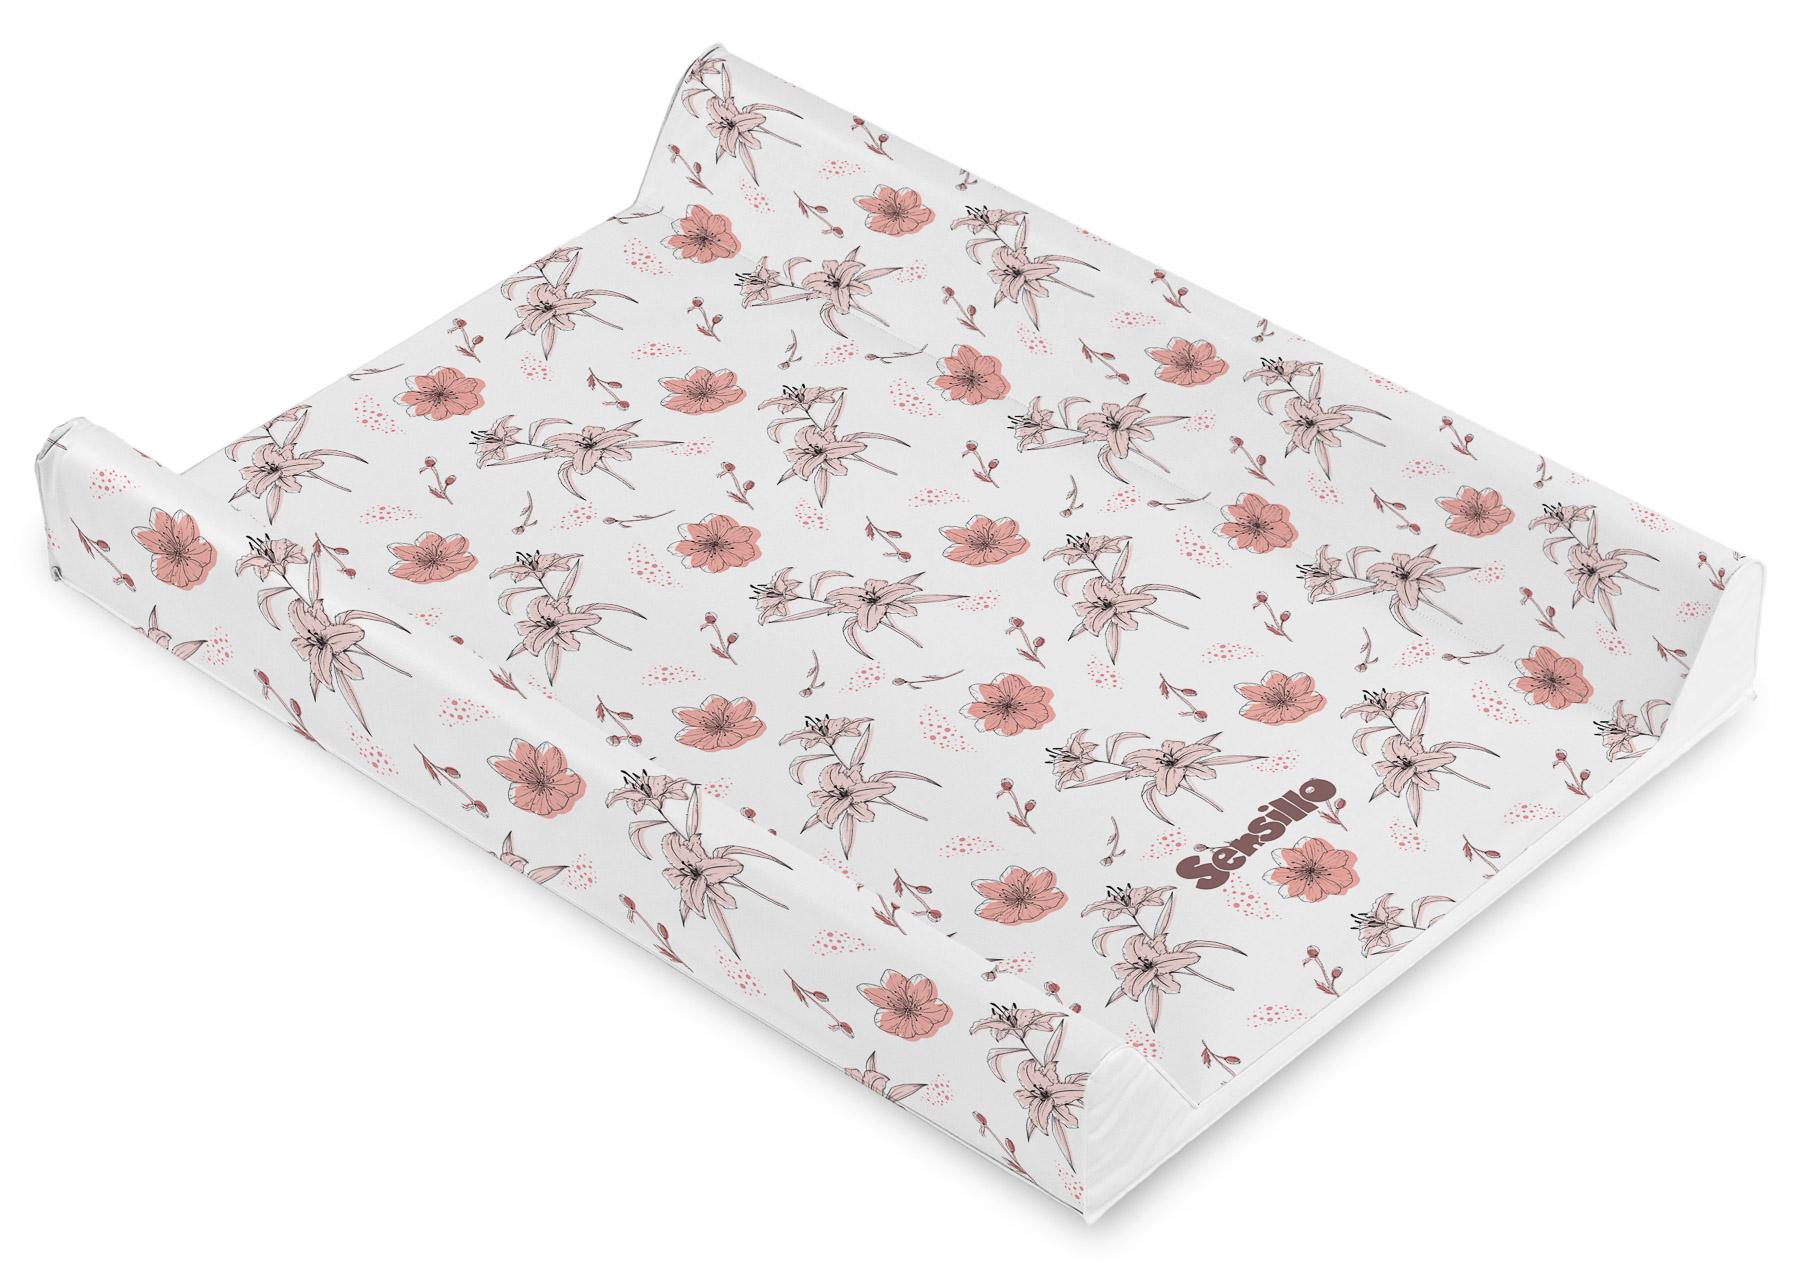 Soft changing pad – Flowers Lilis